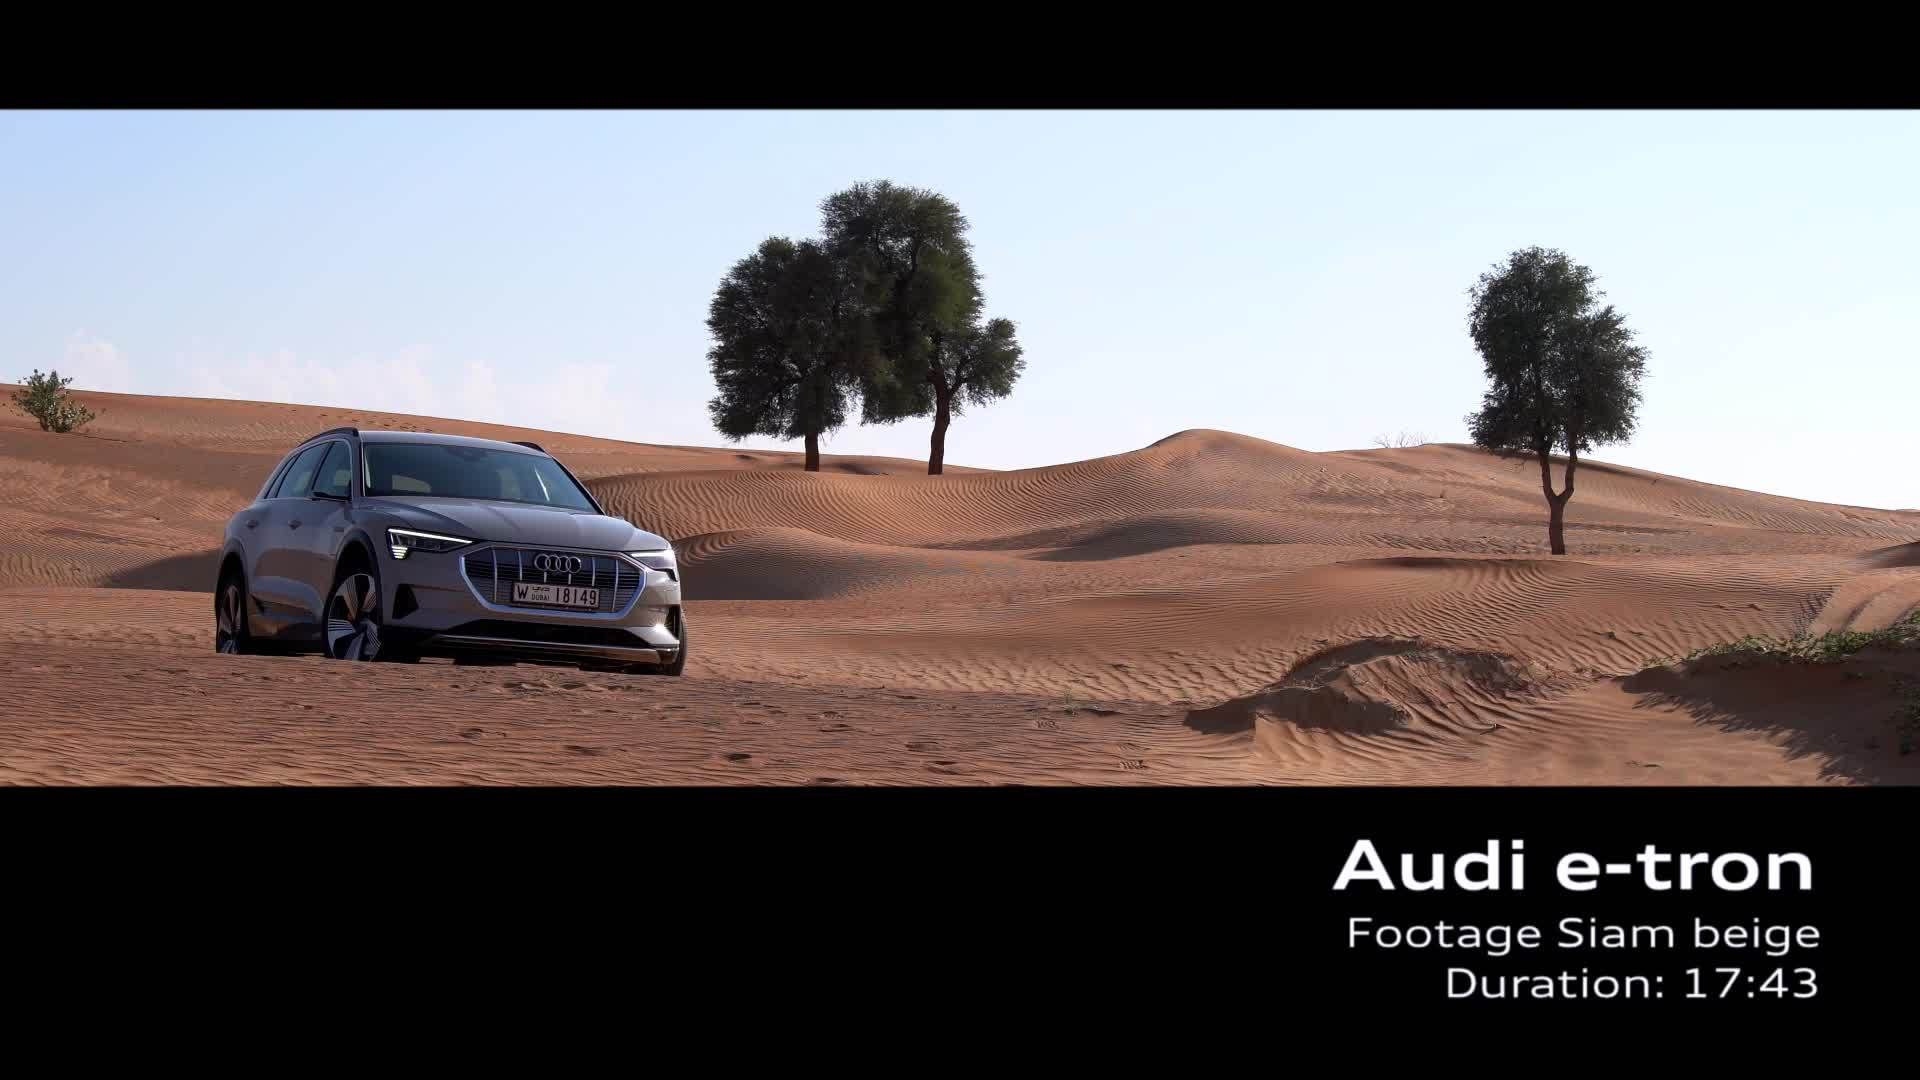 Audi e-tron Siam Beige (Footage)